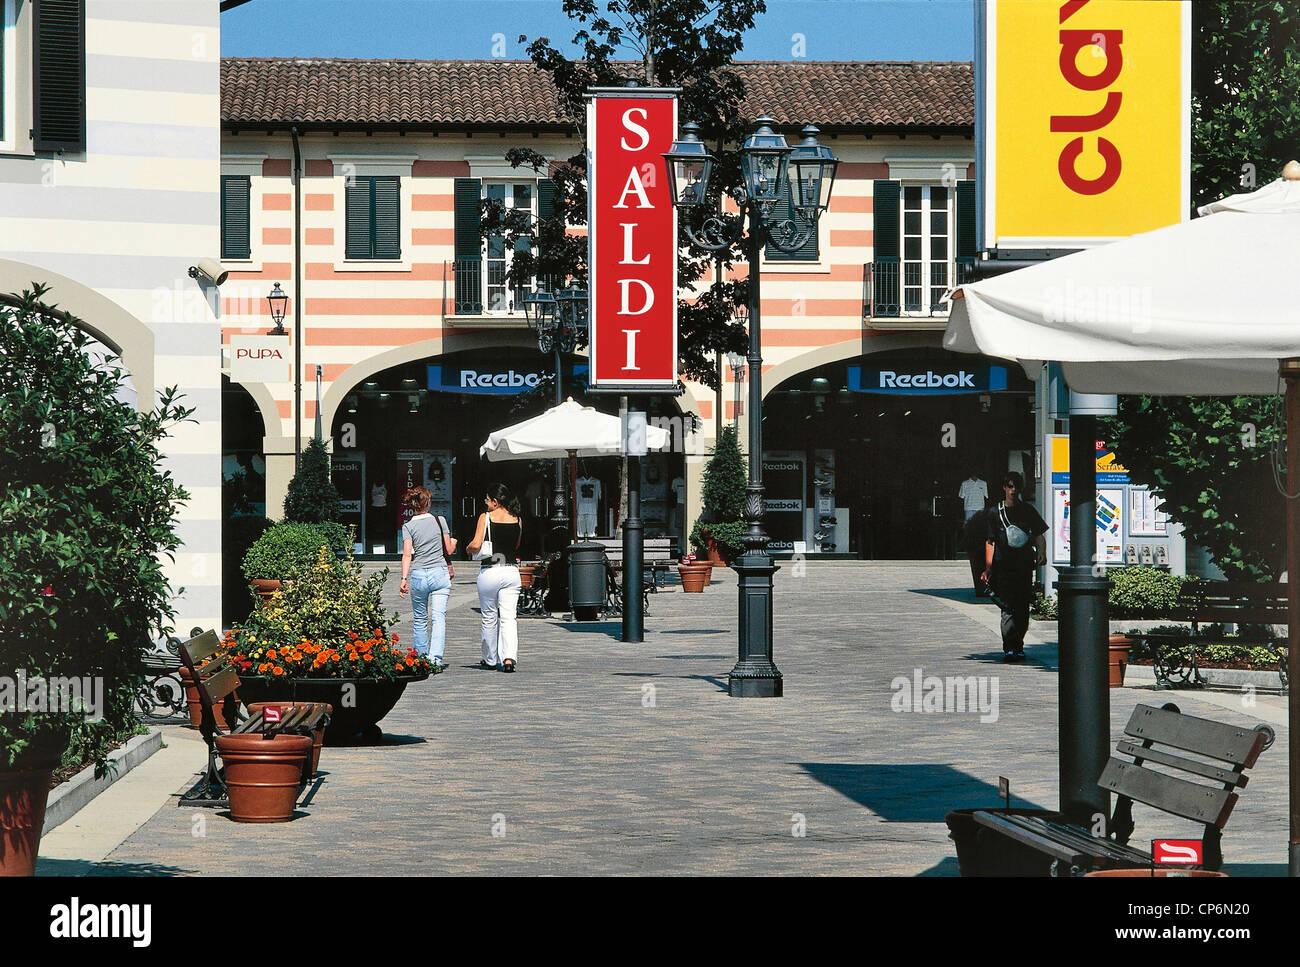 Serravalle Stock Photos & Serravalle Stock Images - Alamy